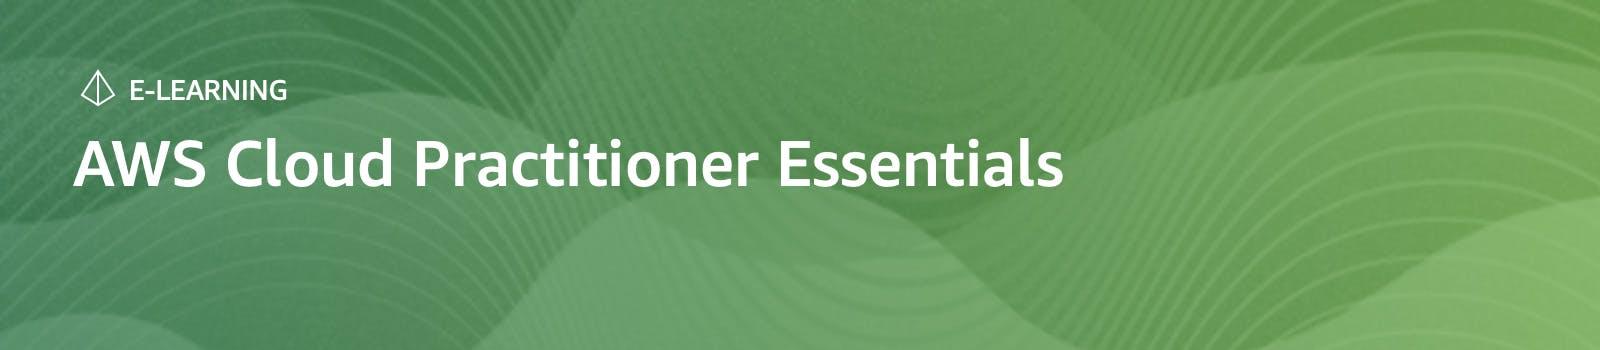 AWS Cloud Practitioner Essentials.jpg